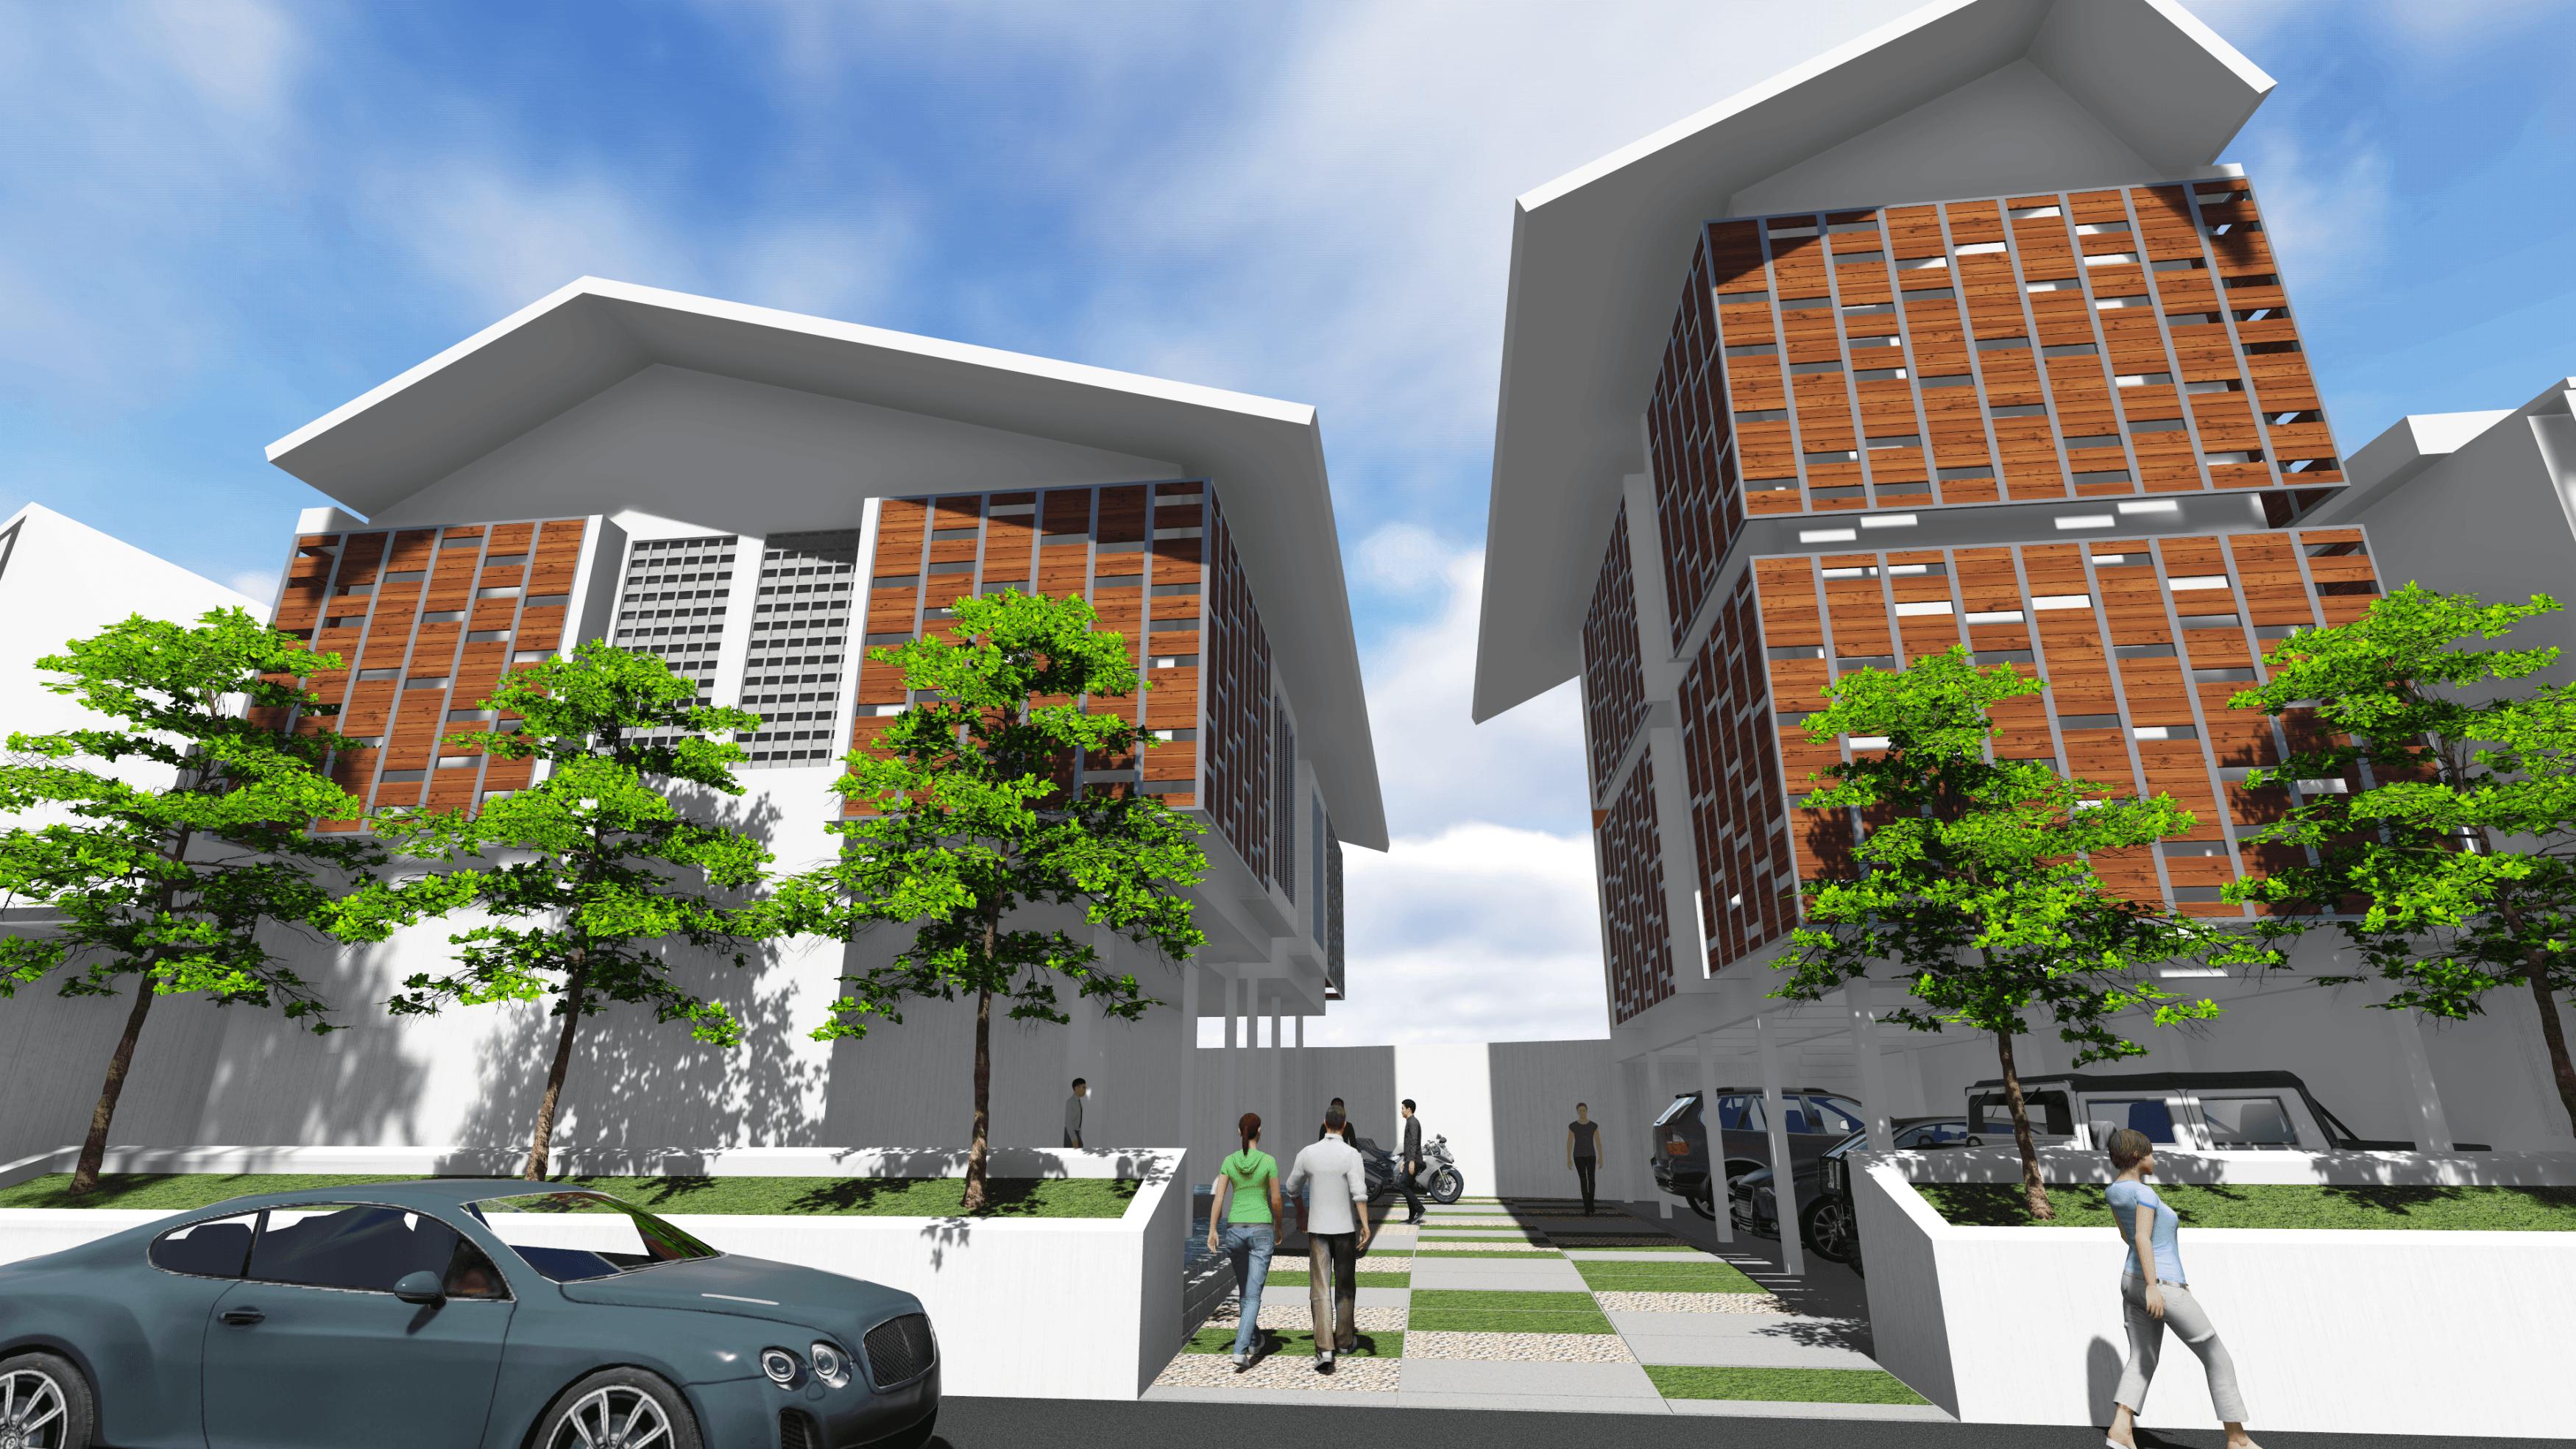 Arah Studio Simongan  Mini Apartment Semarang, Kota Semarang, Jawa Tengah, Indonesia Semarang, Kota Semarang, Jawa Tengah, Indonesia Exterior 4 Kontemporer  31727